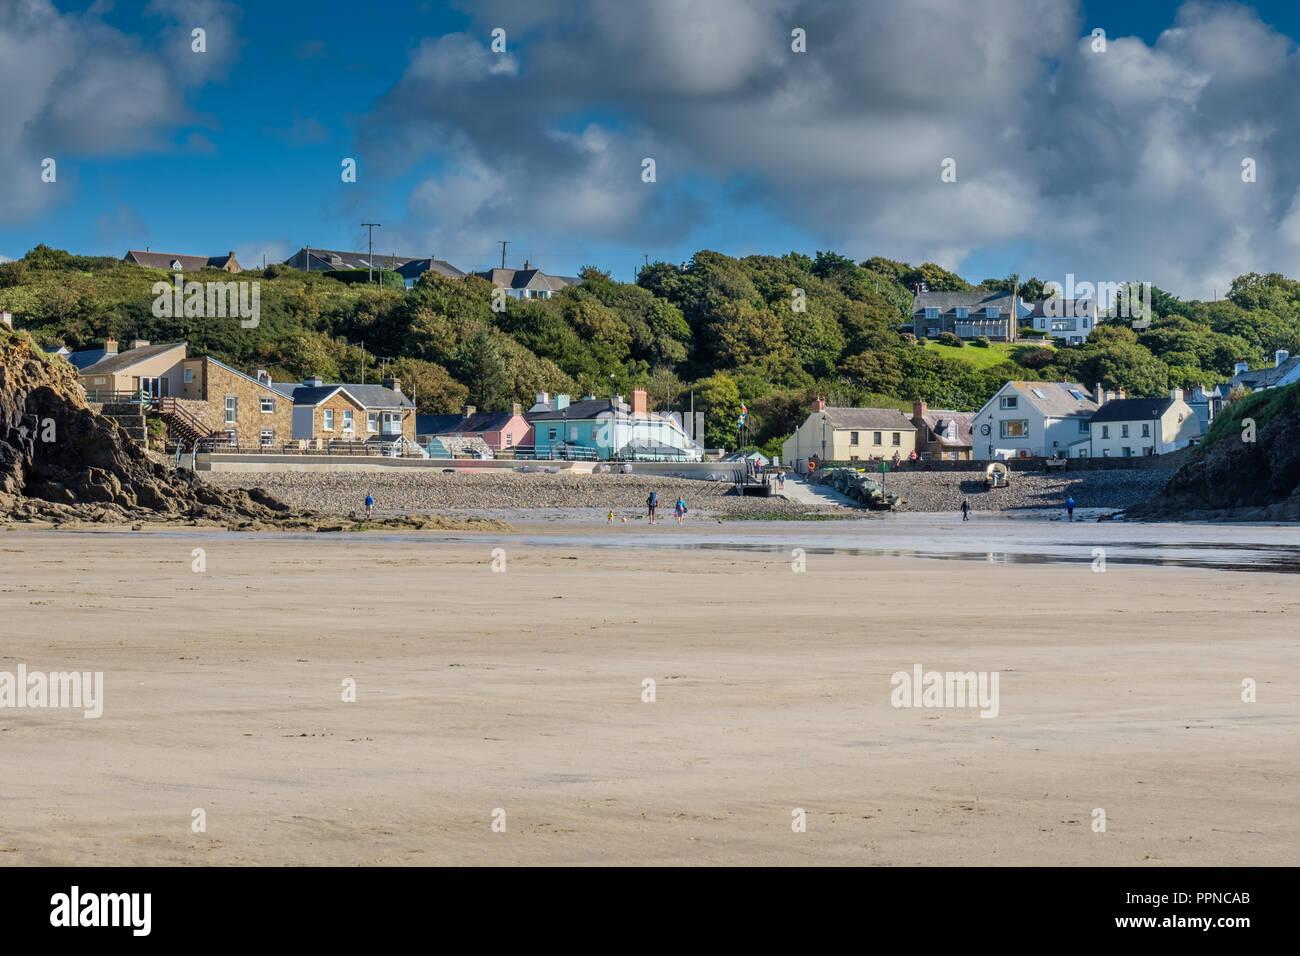 Little Haven, Pembrokeshire, Wales - Stock Image